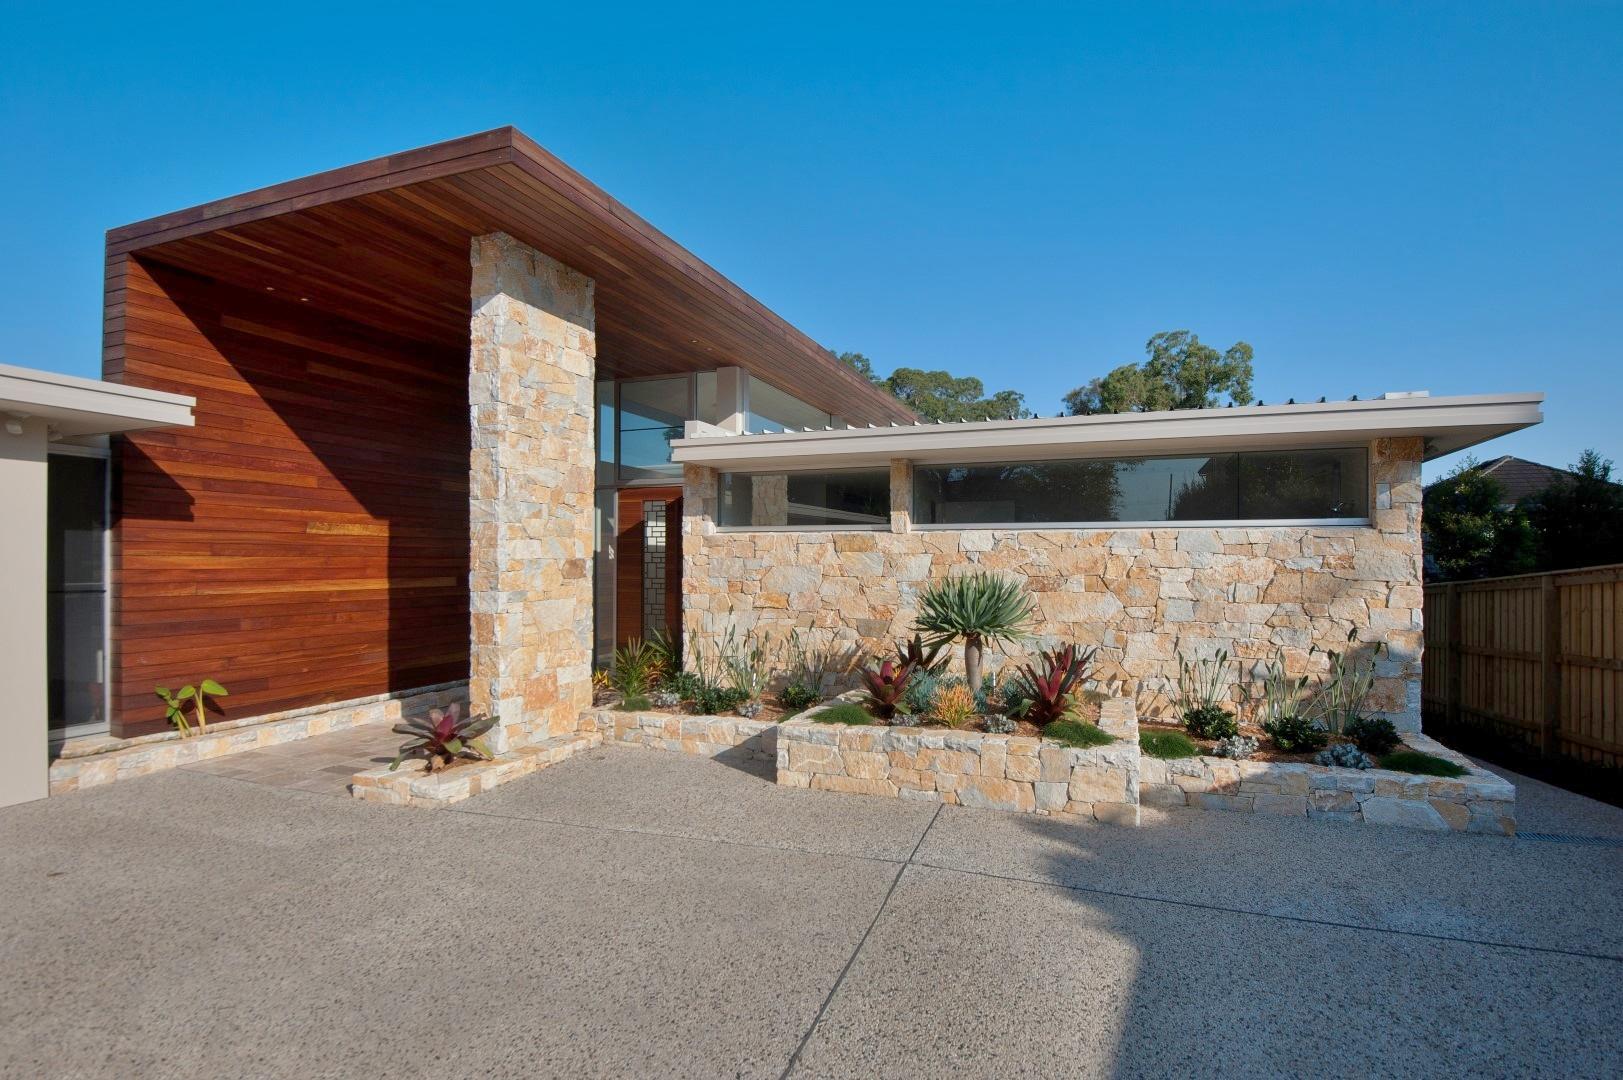 Pt frederick house slater architects for Fredrick house